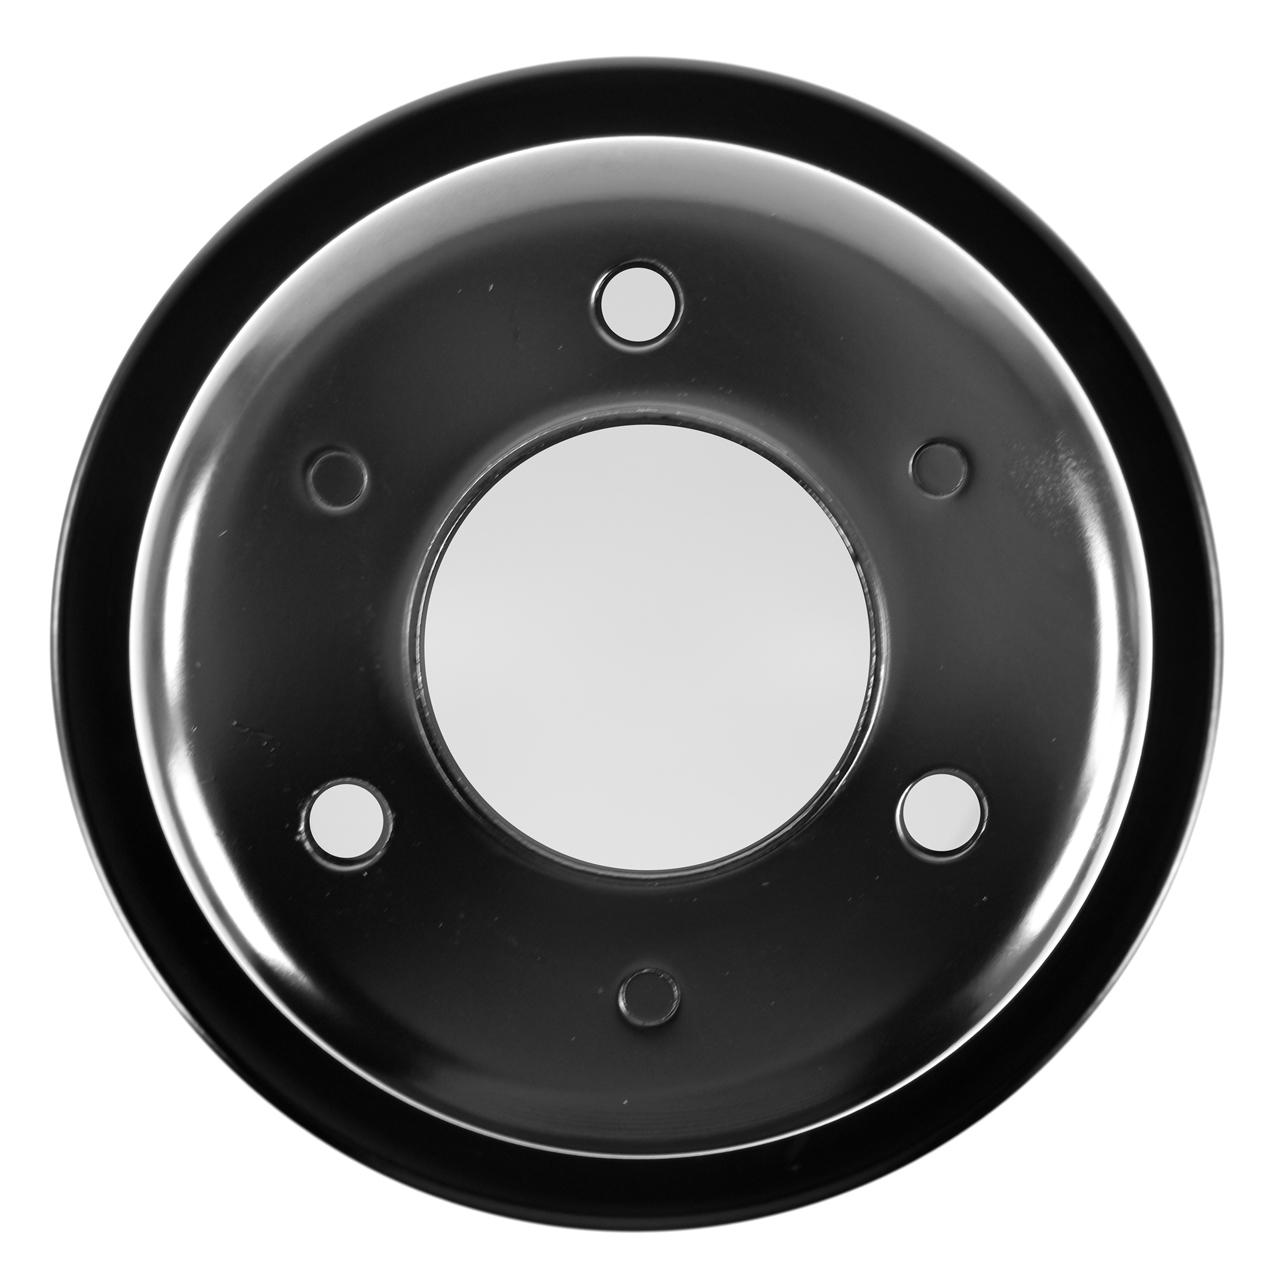 Chrome Plated Steel Crankshaft Pulley Ford 289 1965-1966 3 Bolt Holes v 8